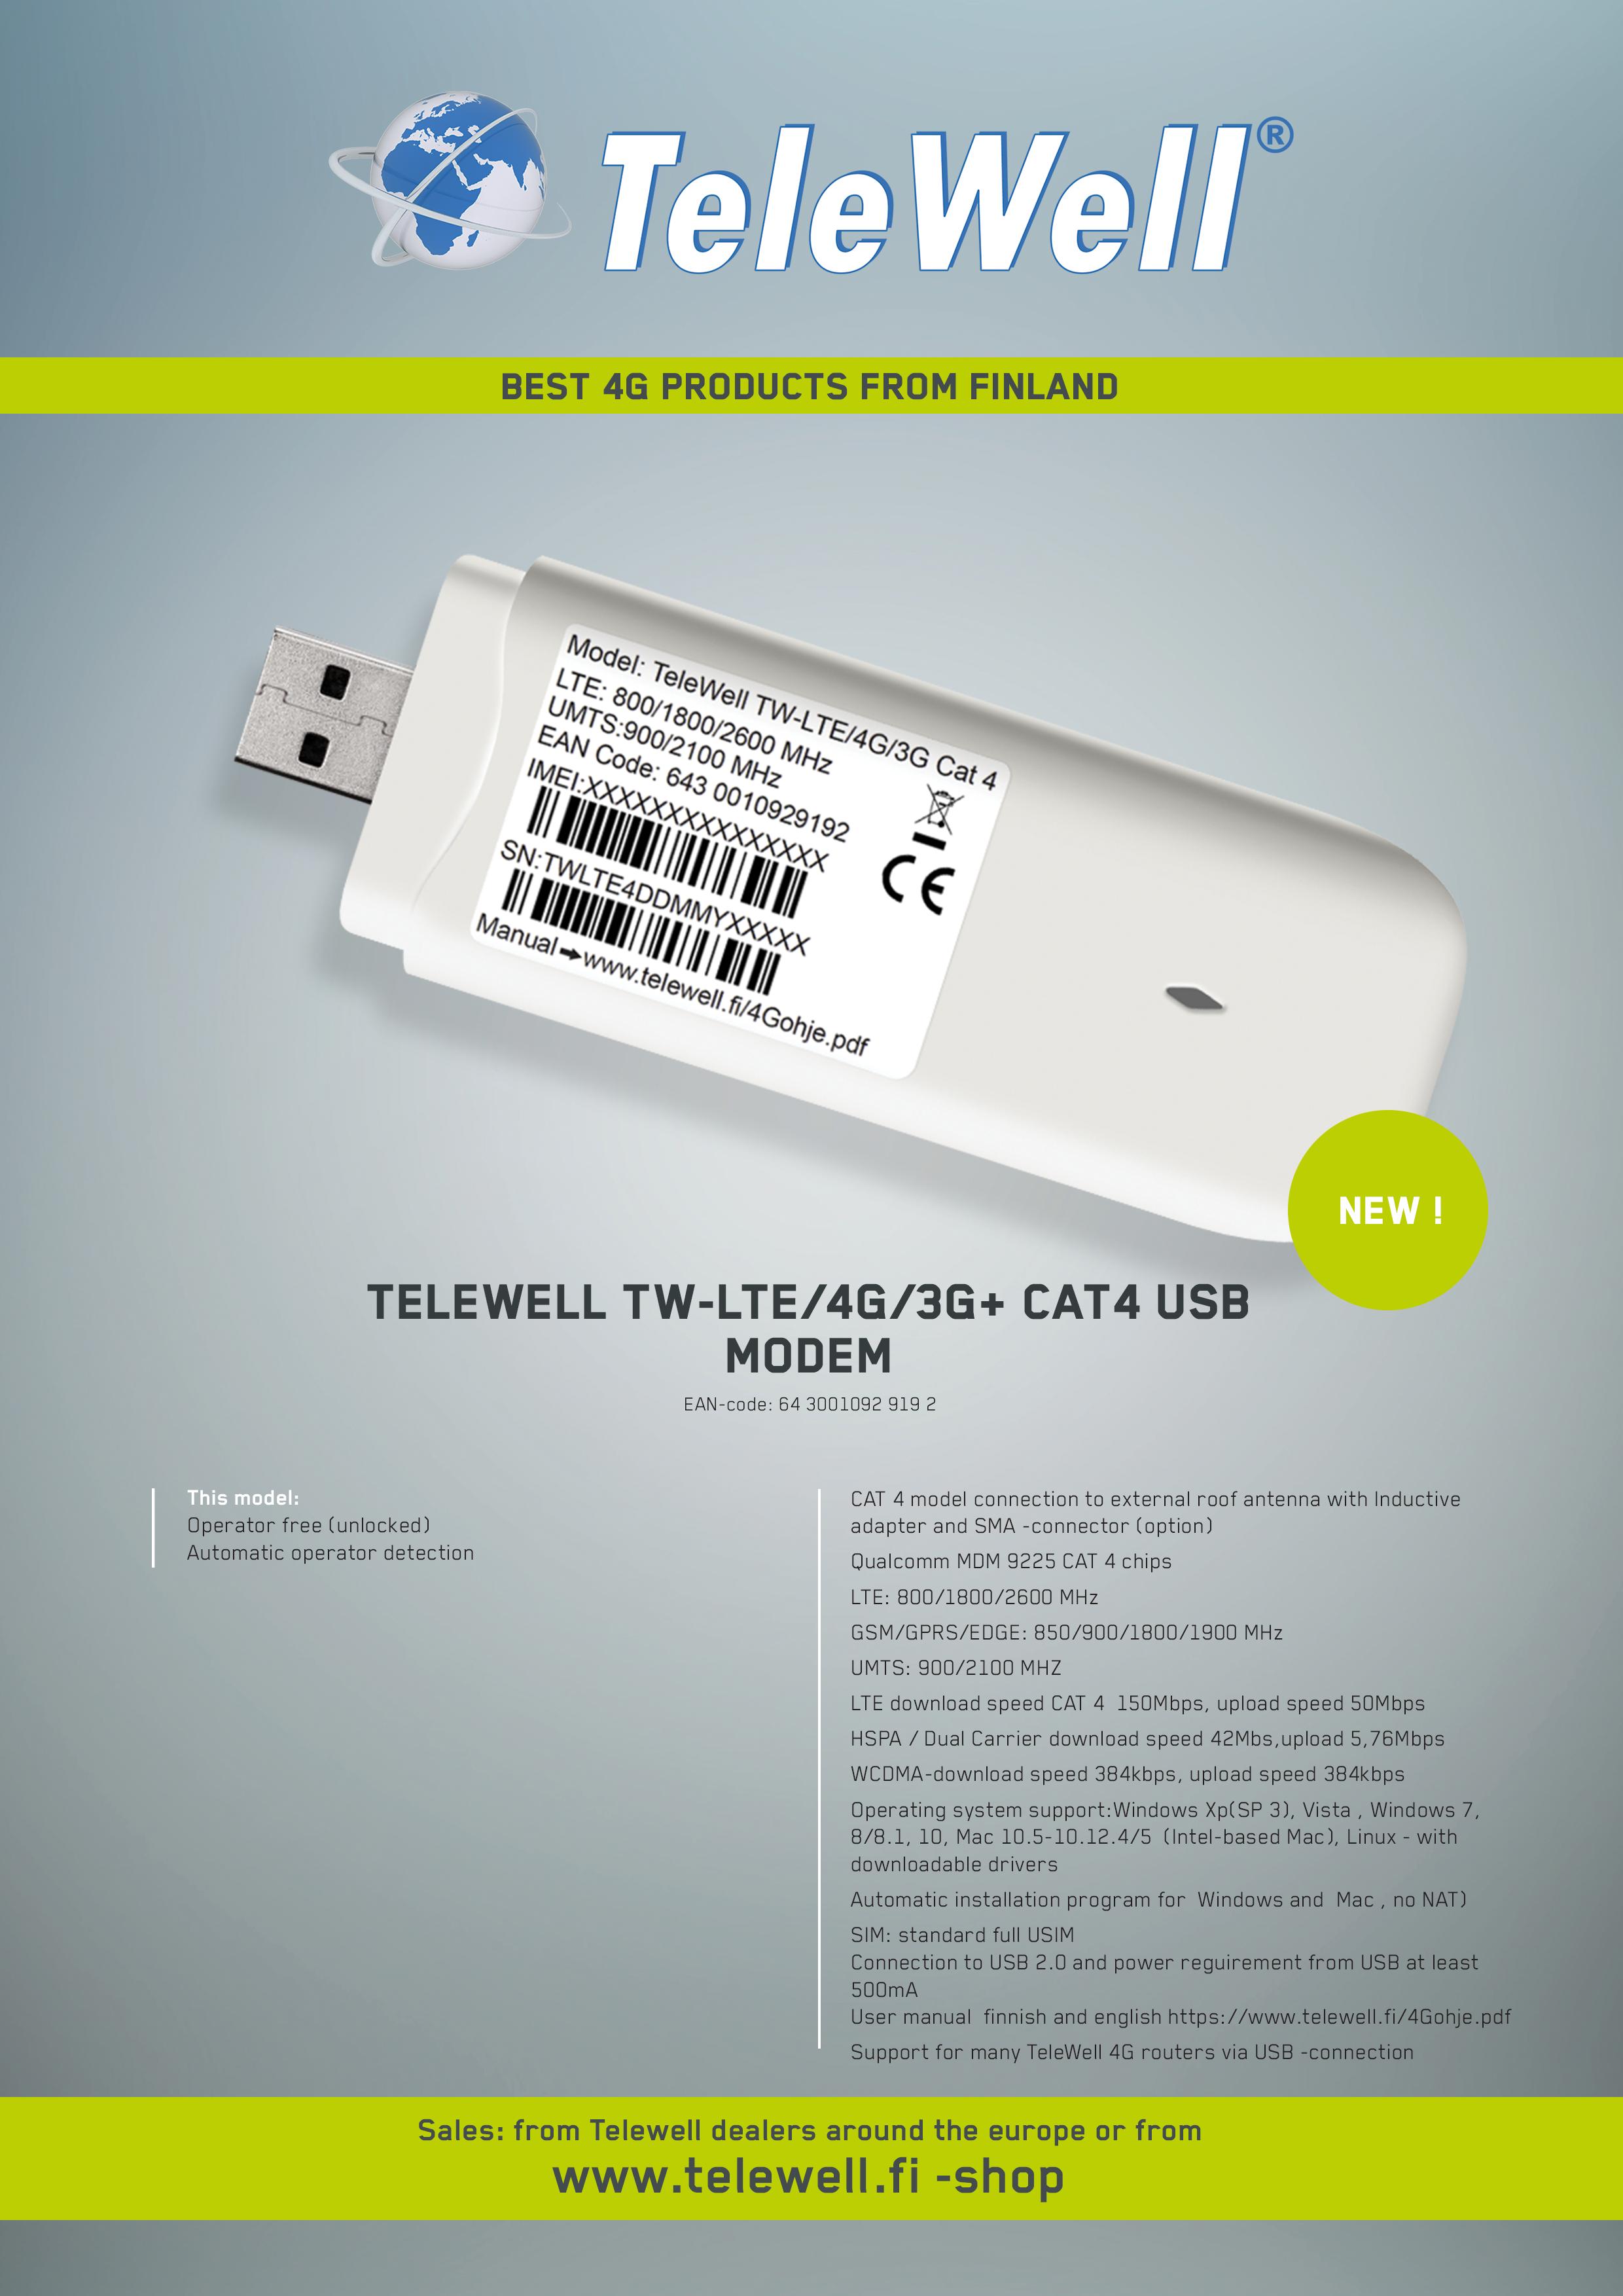 Telewell - TW-LTE/4G/3G Cat 4 modem